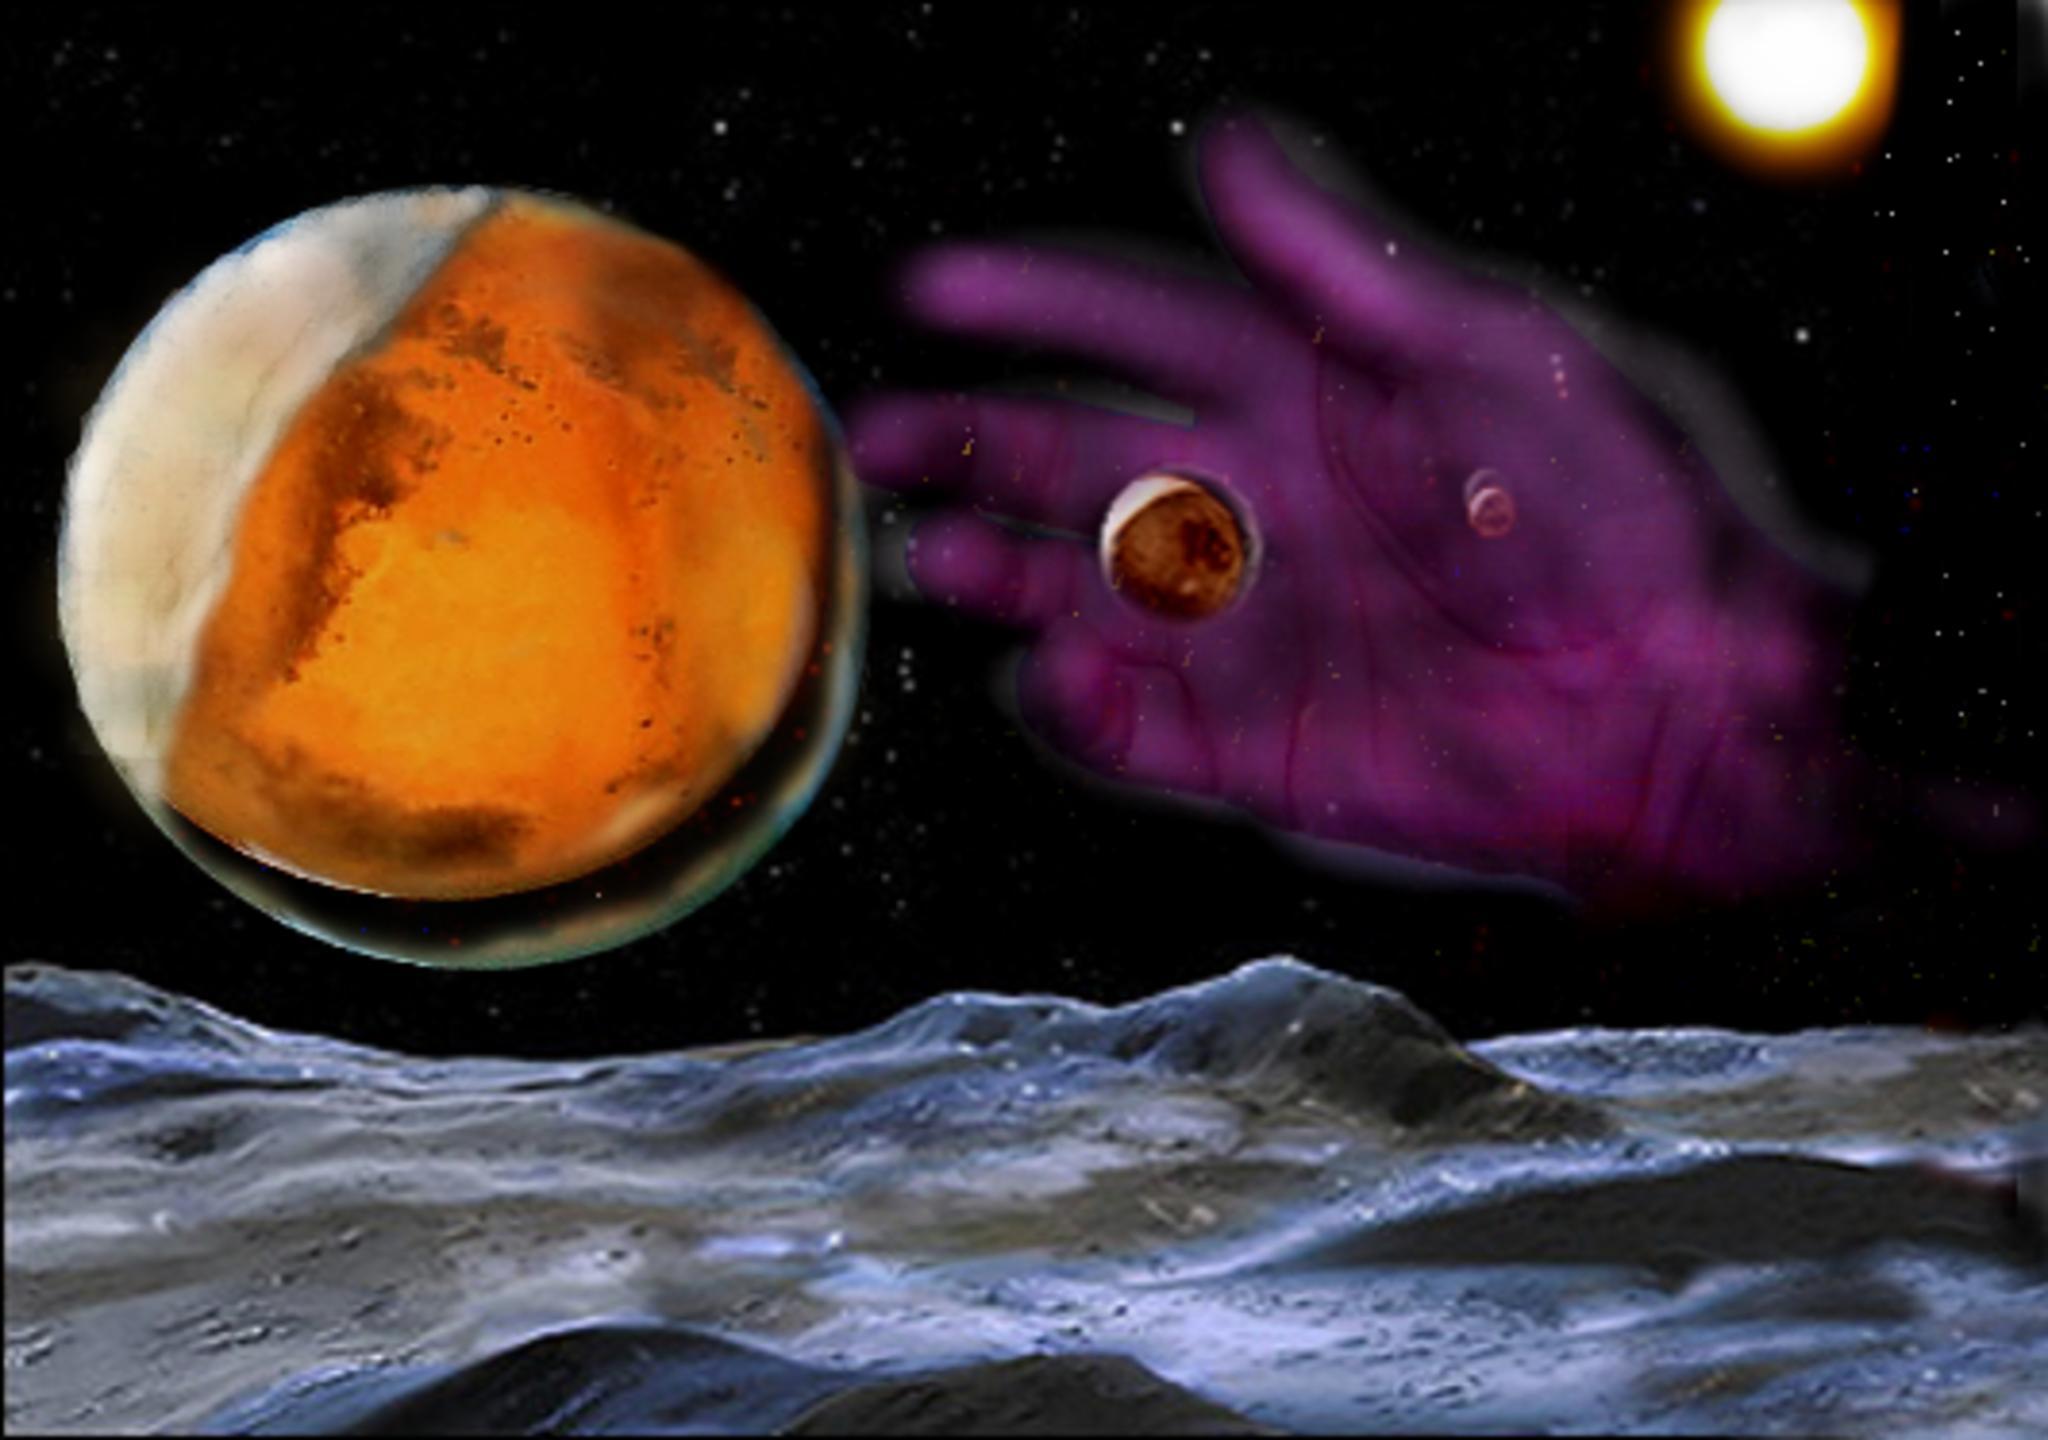 The hand of God by Alex Ingram